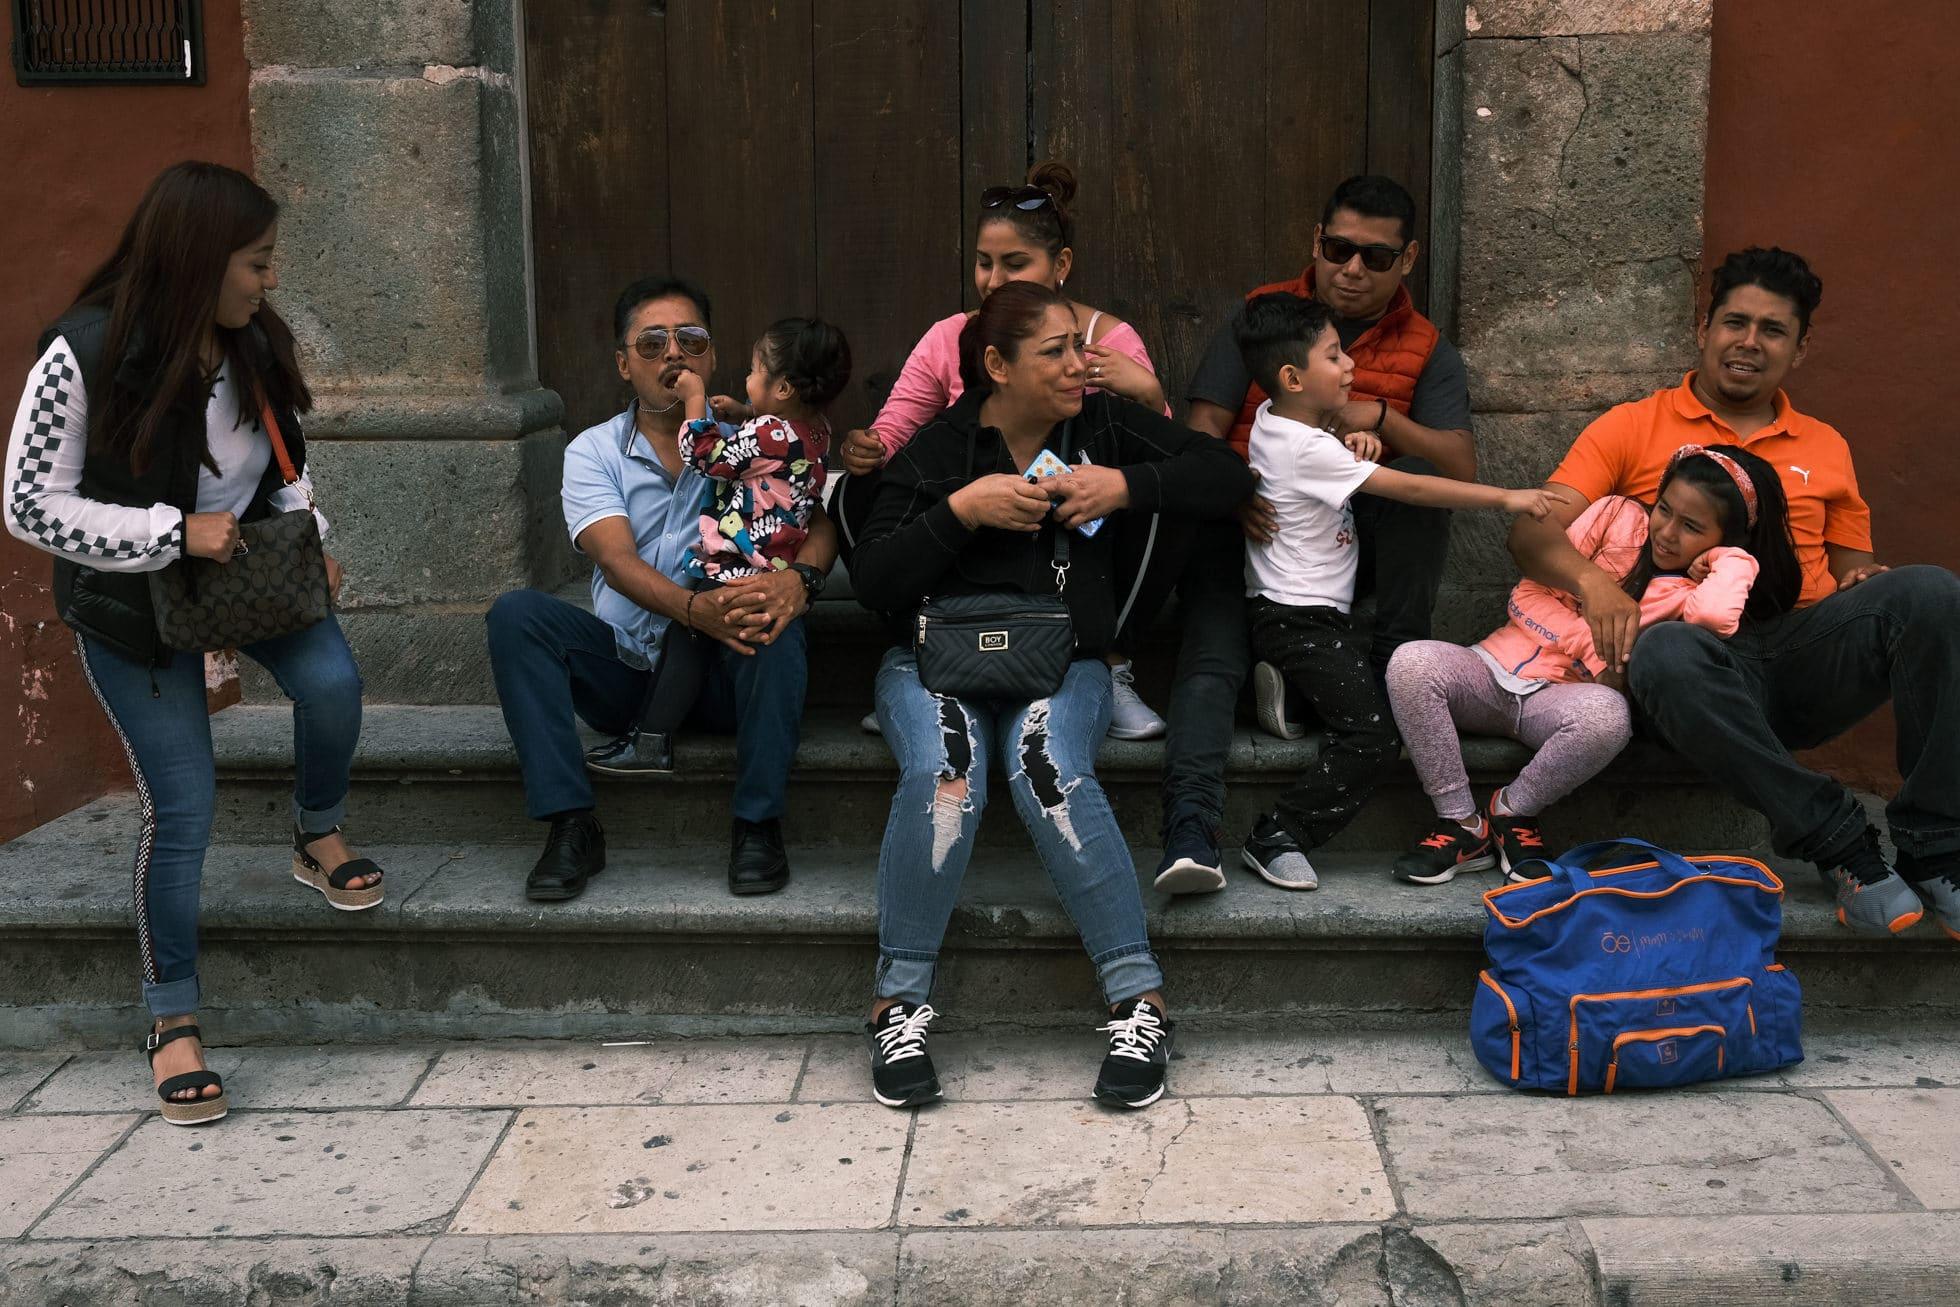 fujifilm-x-pro3-mexico-street-photography-50